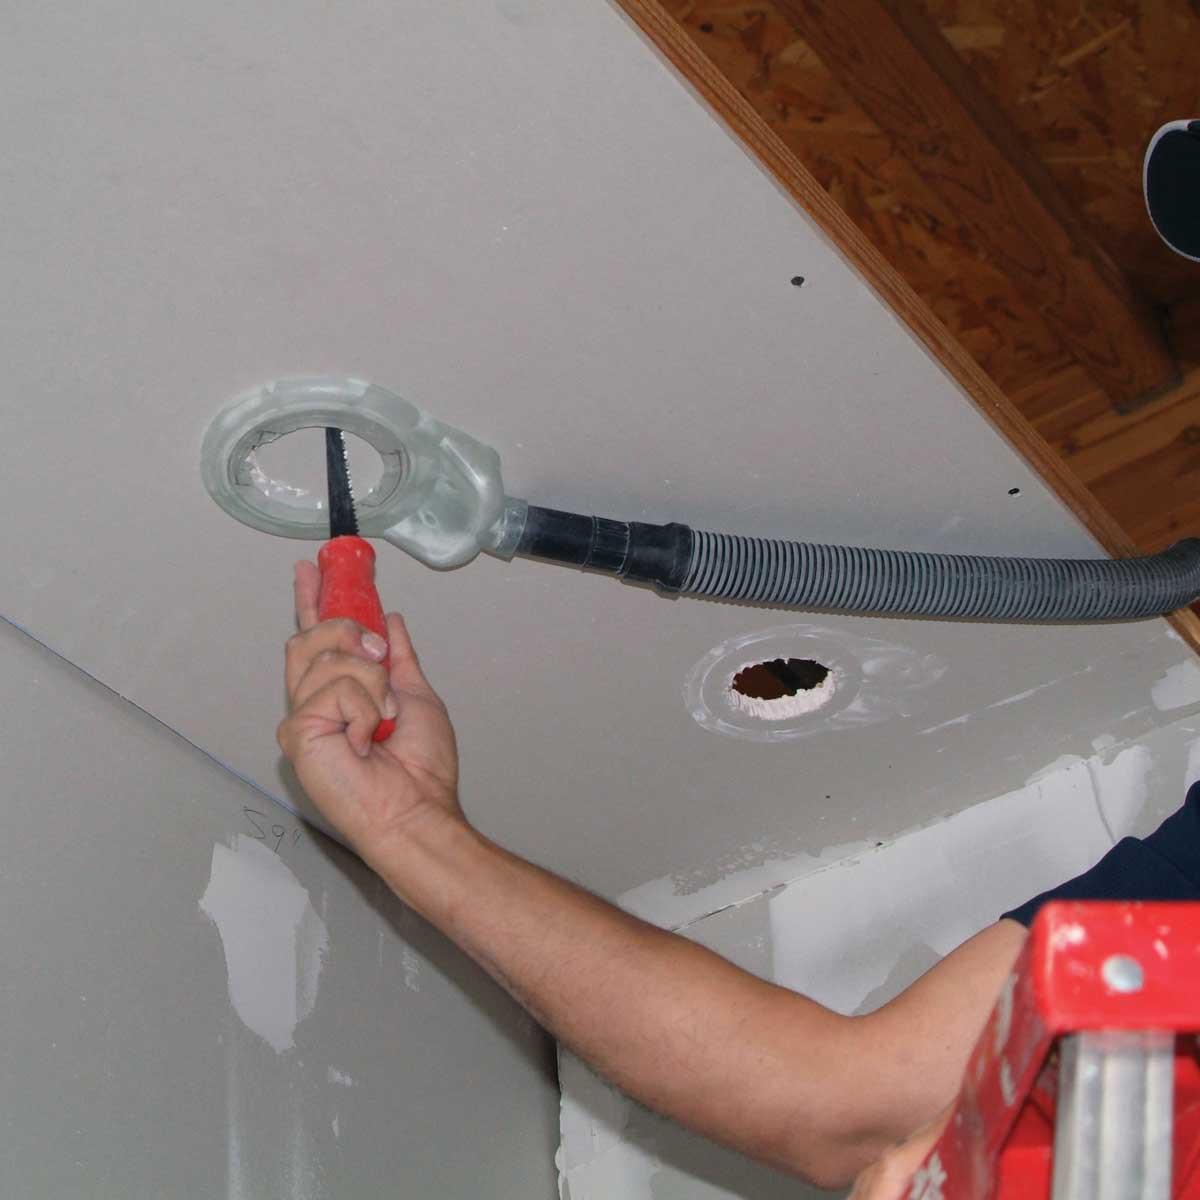 bitbuddie knife cutting ceiling